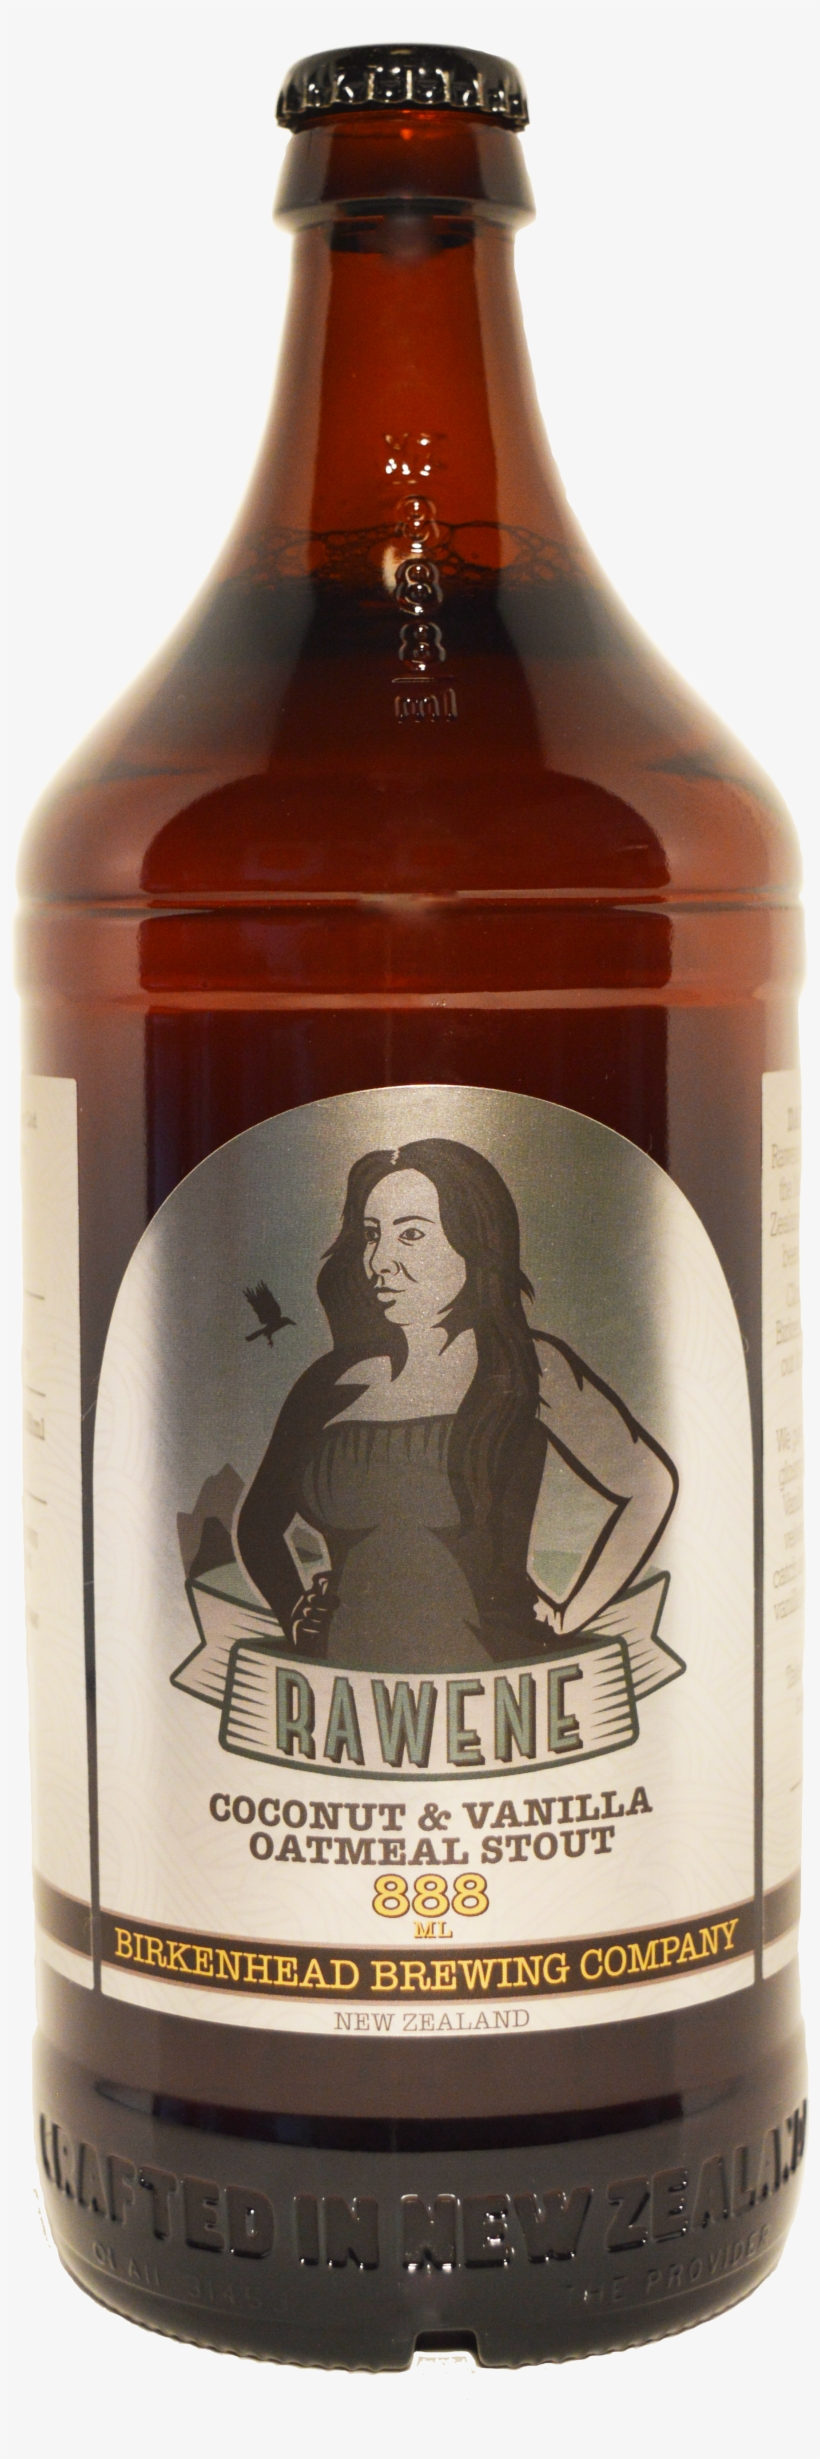 Rawene Coco & Van Oatmeal Stout - Birkenhead Brewing Company Rawene Stout (888ml), transparent png #650396